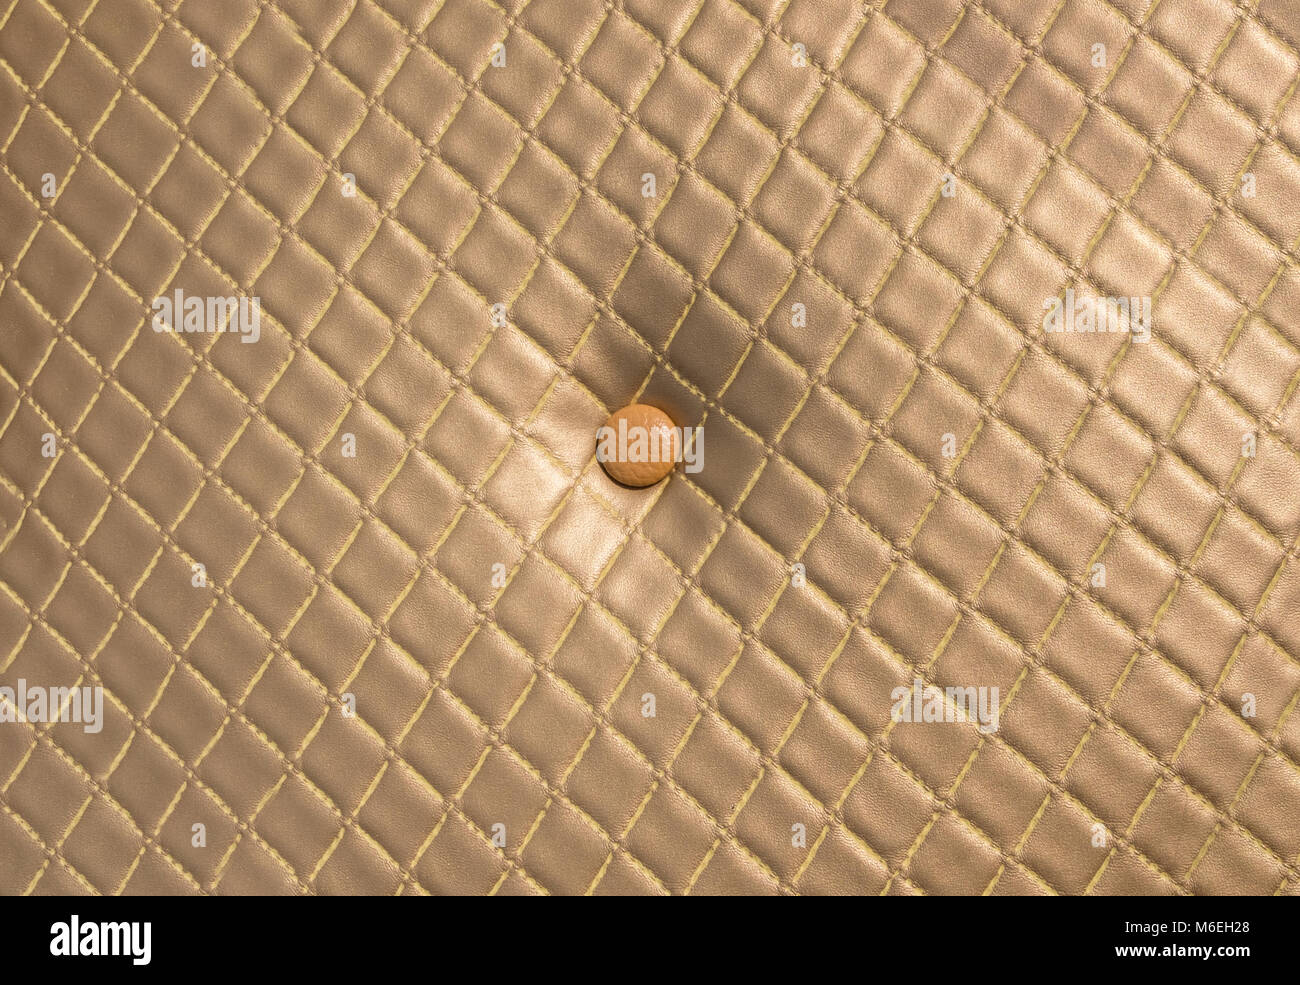 Polstermöbel leder  Gold vintage Polstermöbel Sofa Leder Textur Oberfläche Hintergrund ...